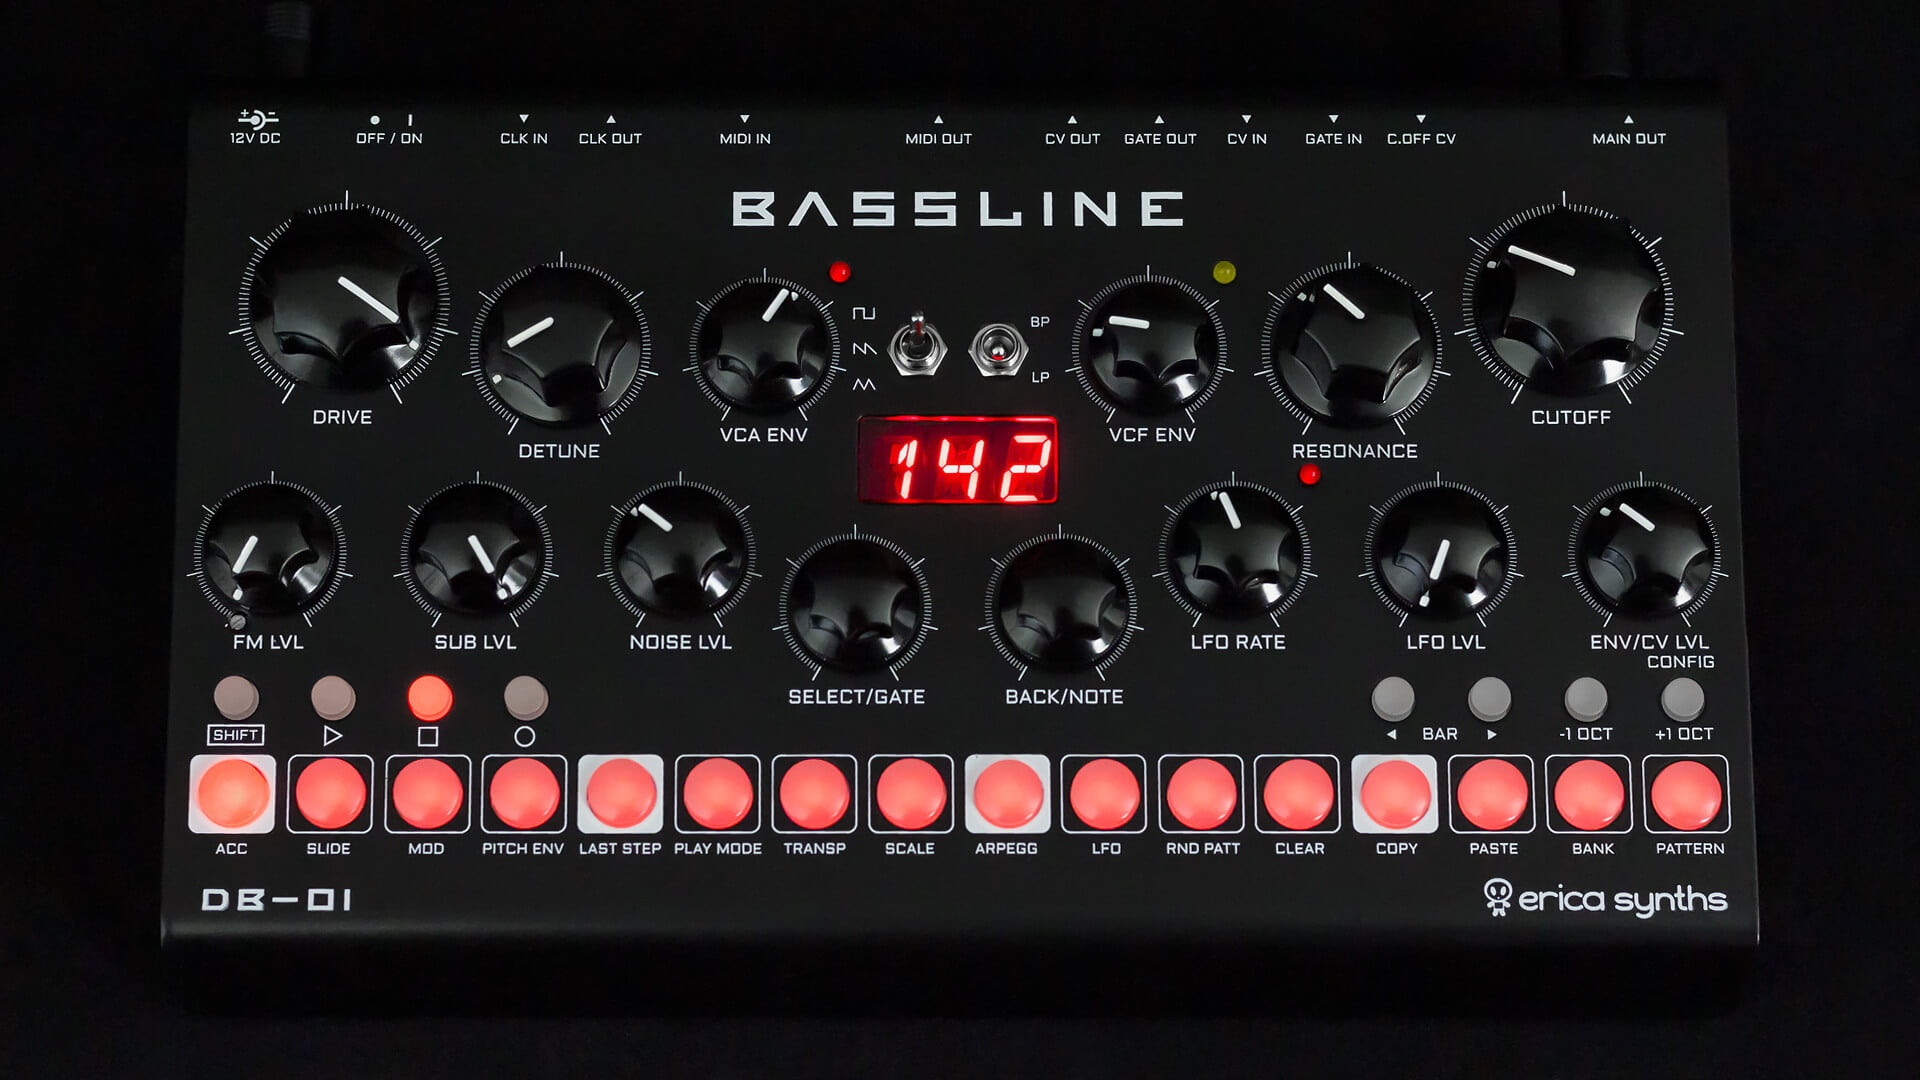 Erica Synths announced Bassline DB-01 desktop synthesizer